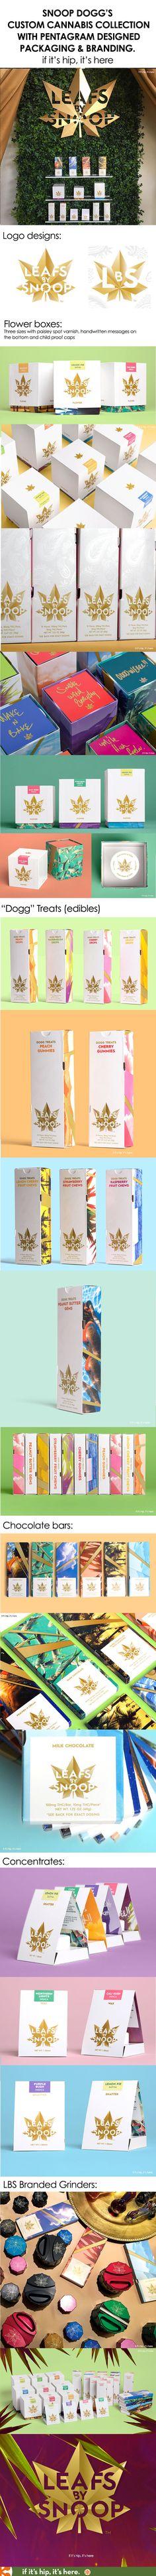 Beautifully designed packaging and branding for Leafs By Snoop by Pentagram.